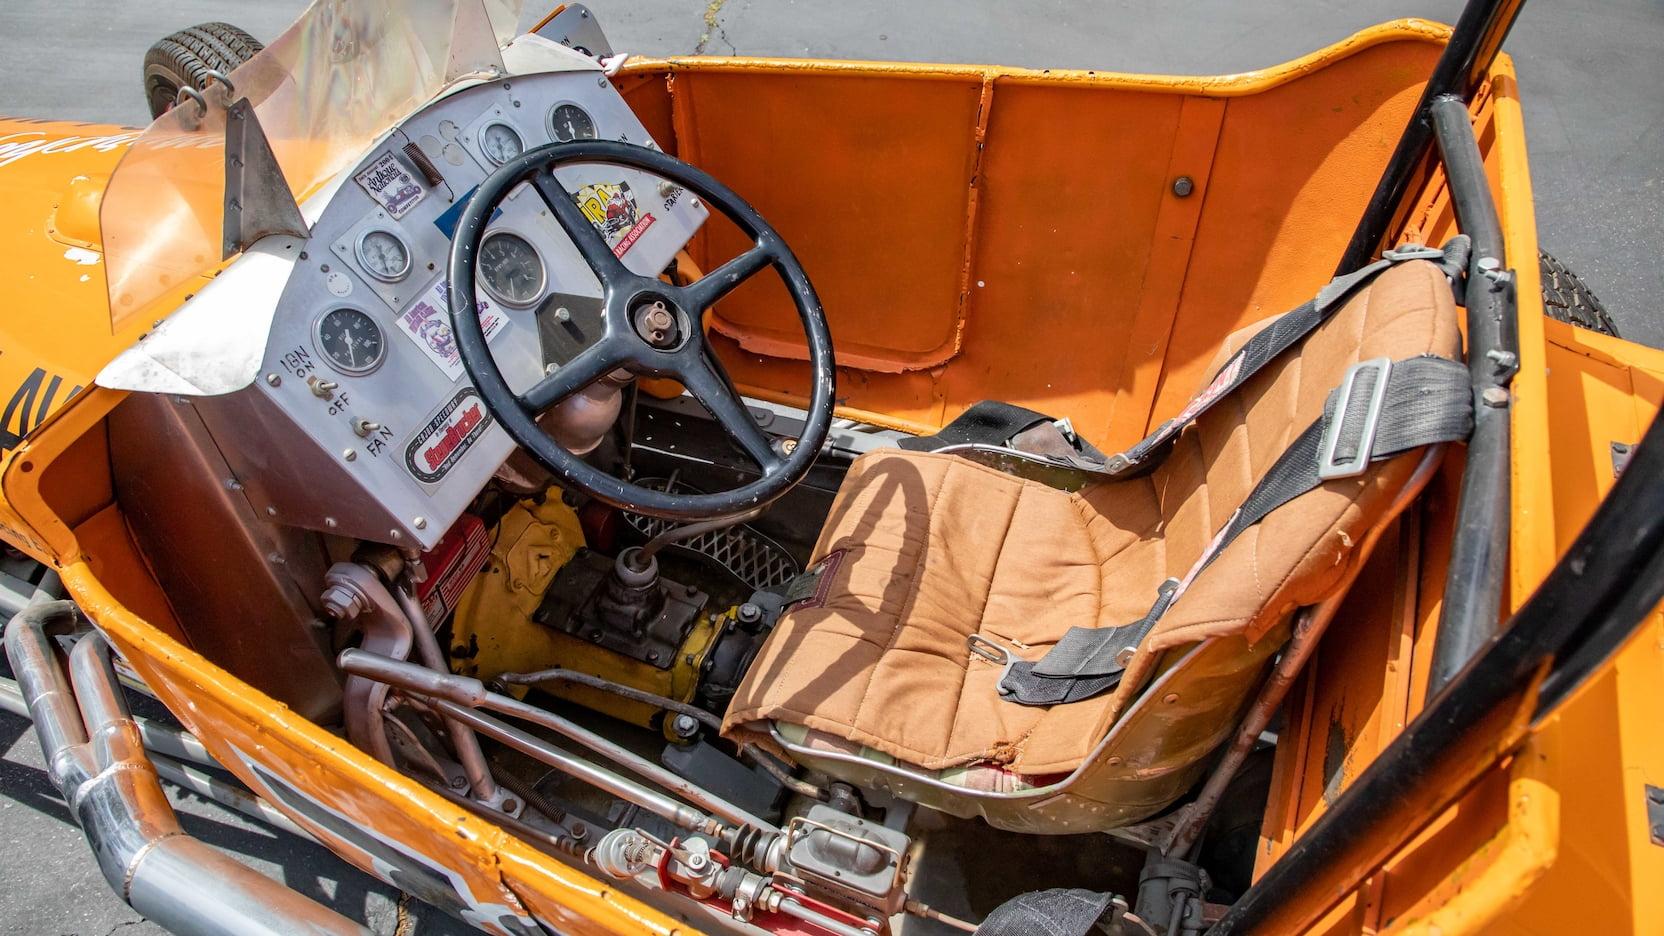 1927 Ford T-bucket track roadster Parnelli Jones Mecum interior